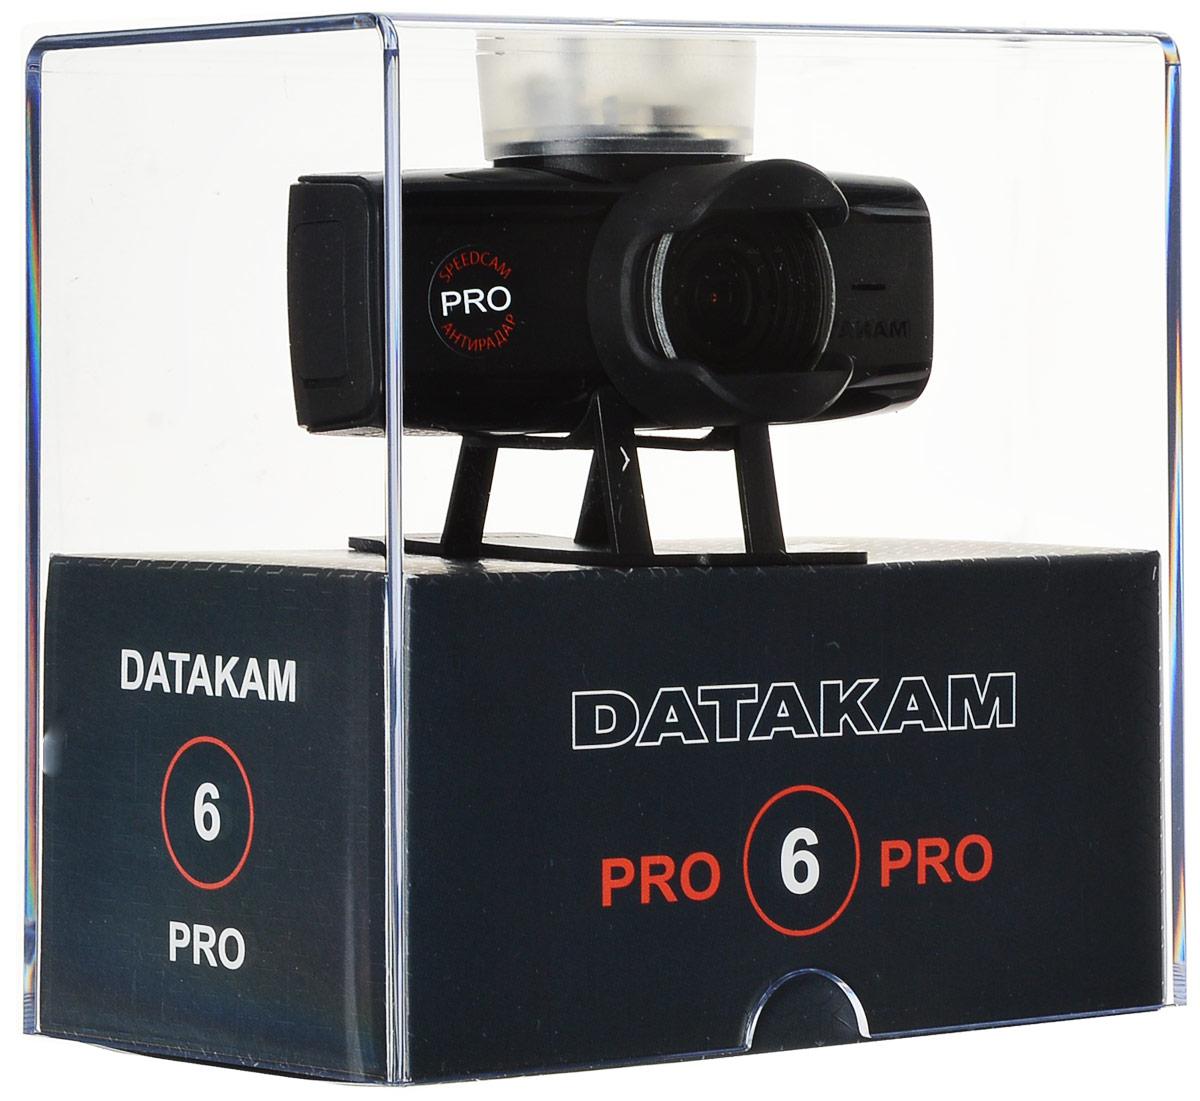 Datakam 6 Pro, Blackвидеорегистратор Datakam